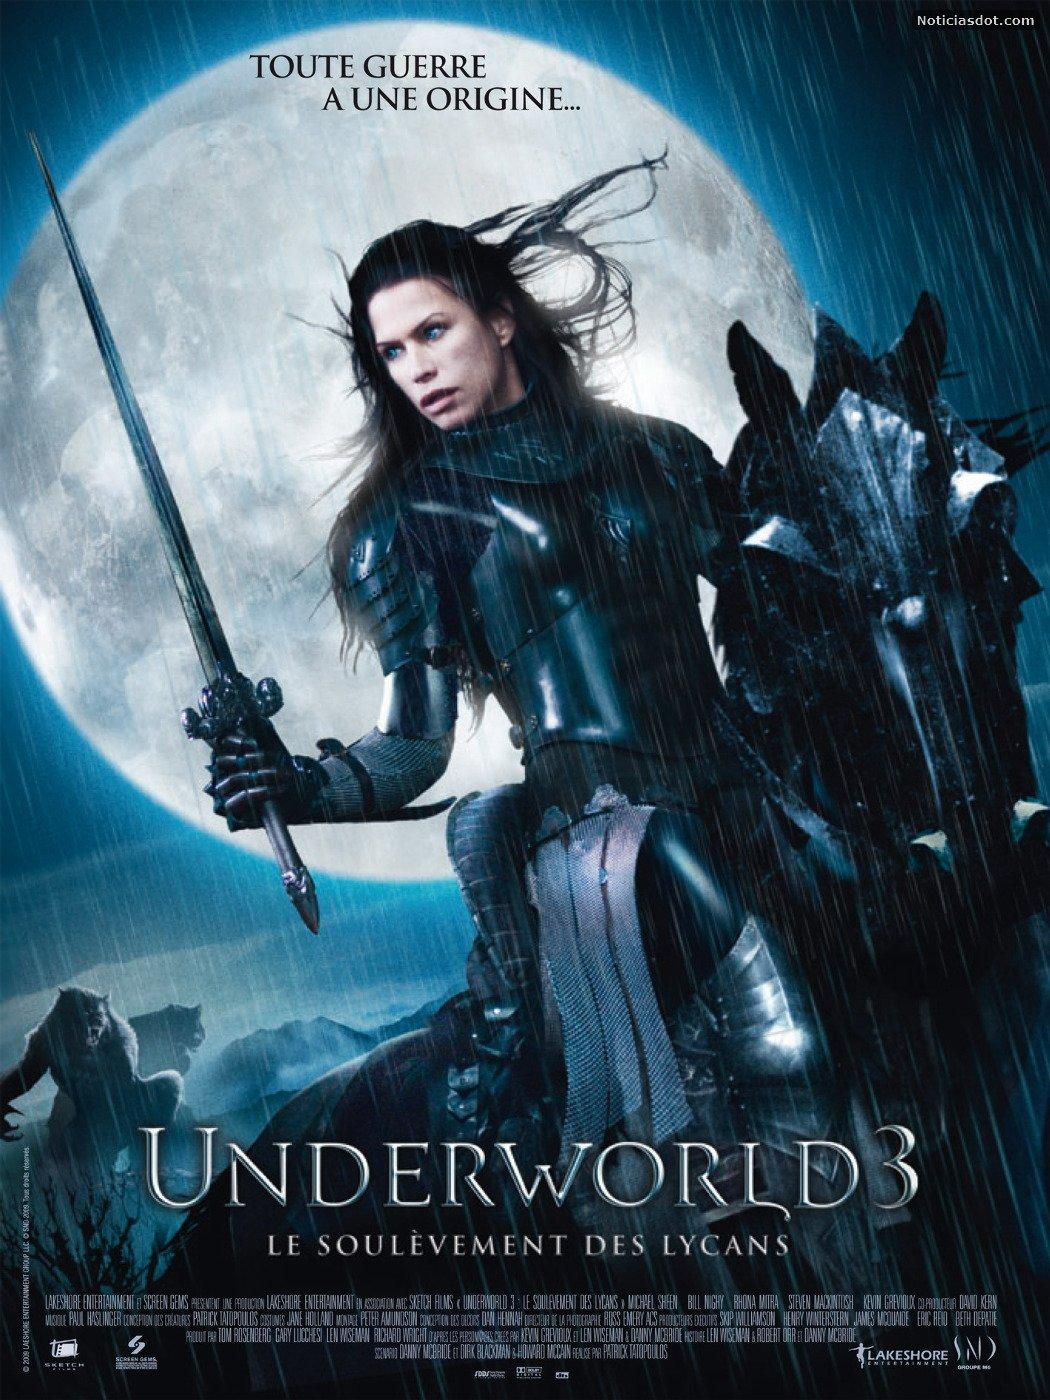 Descargar Underworld 3 - Inframundo 3 - Español Latino - Mediafire